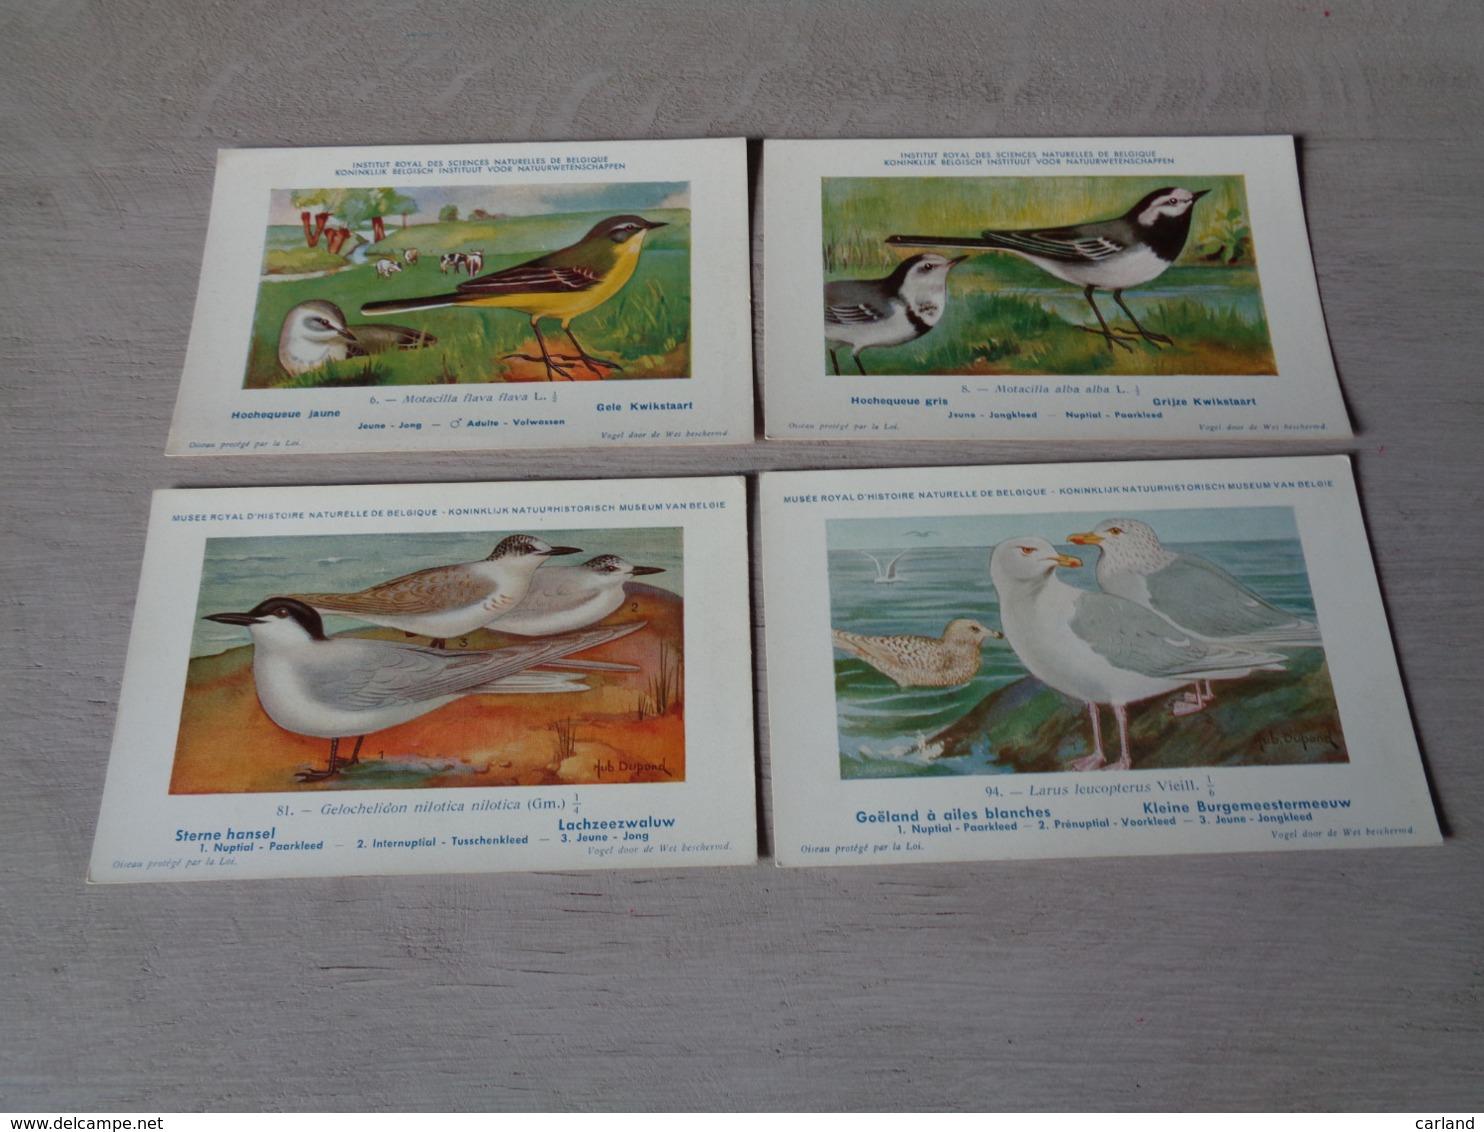 Beau Lot De 20 Cartes Postales Oiseaux  Oiseau  Illustrateur H.Dupond     Mooi Lot Van 20 Postkaarten Van Vogels  Vogel - Cartes Postales